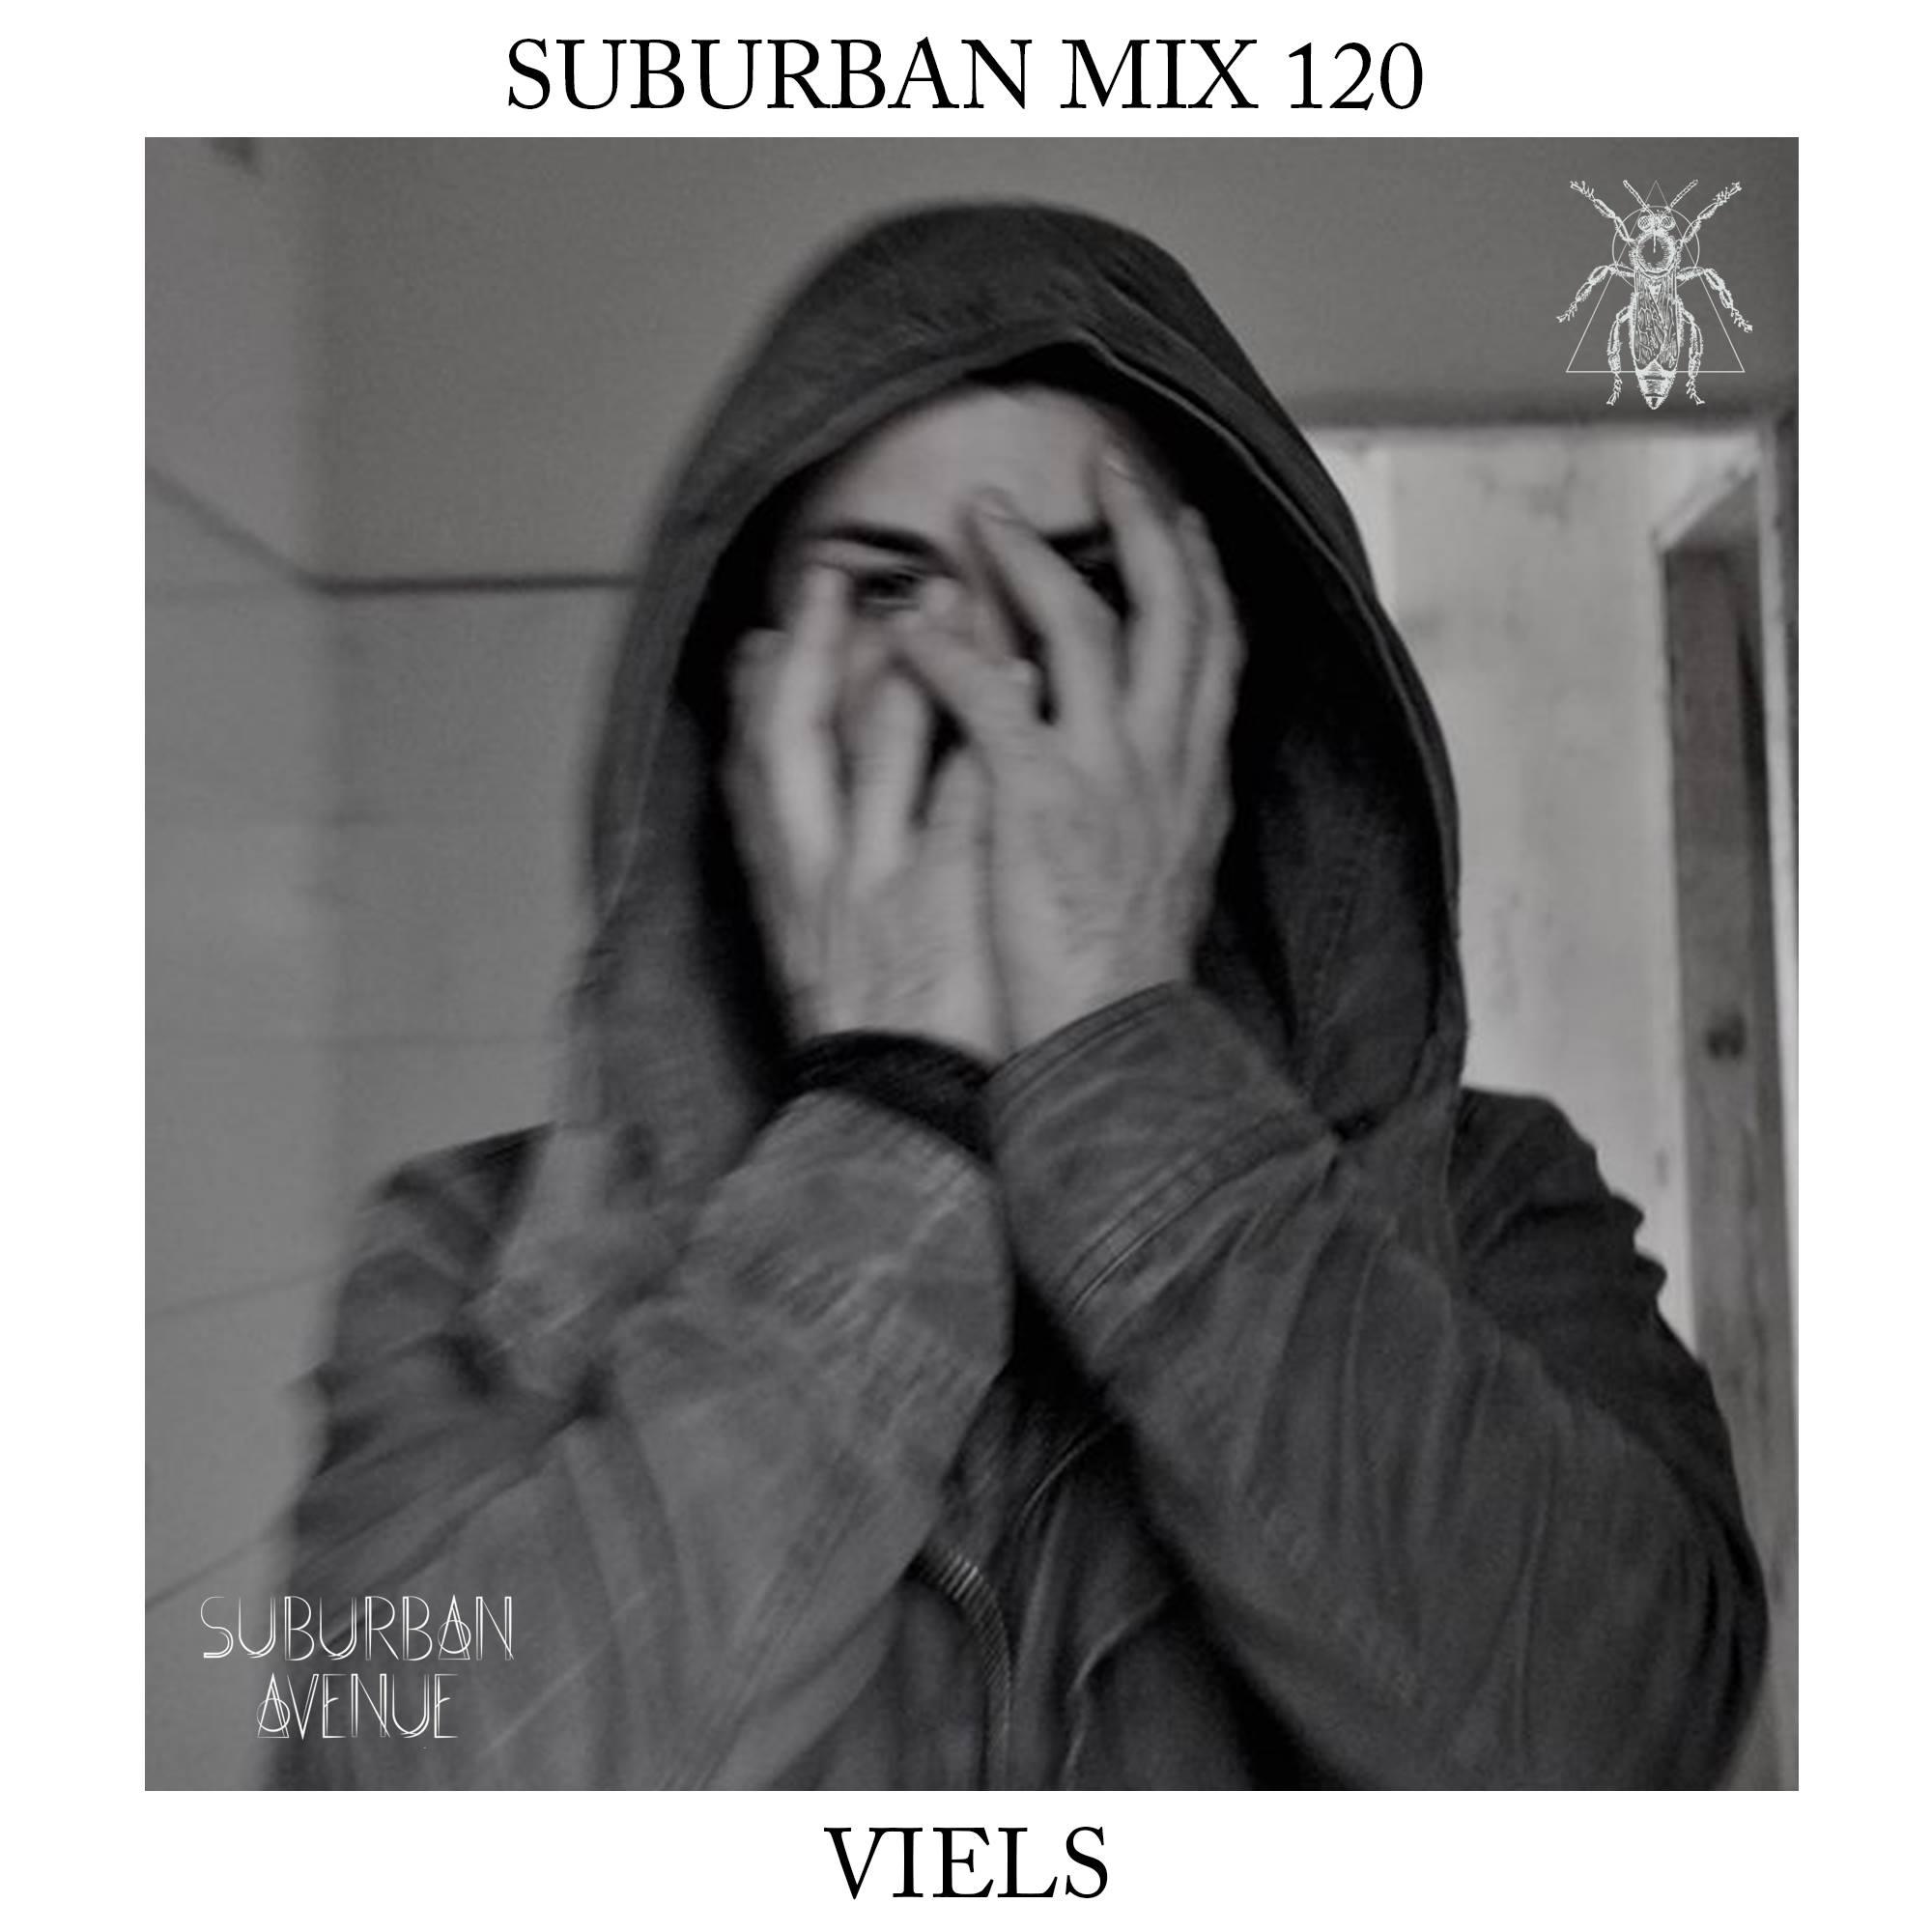 Suburban Mix 120 - Viels